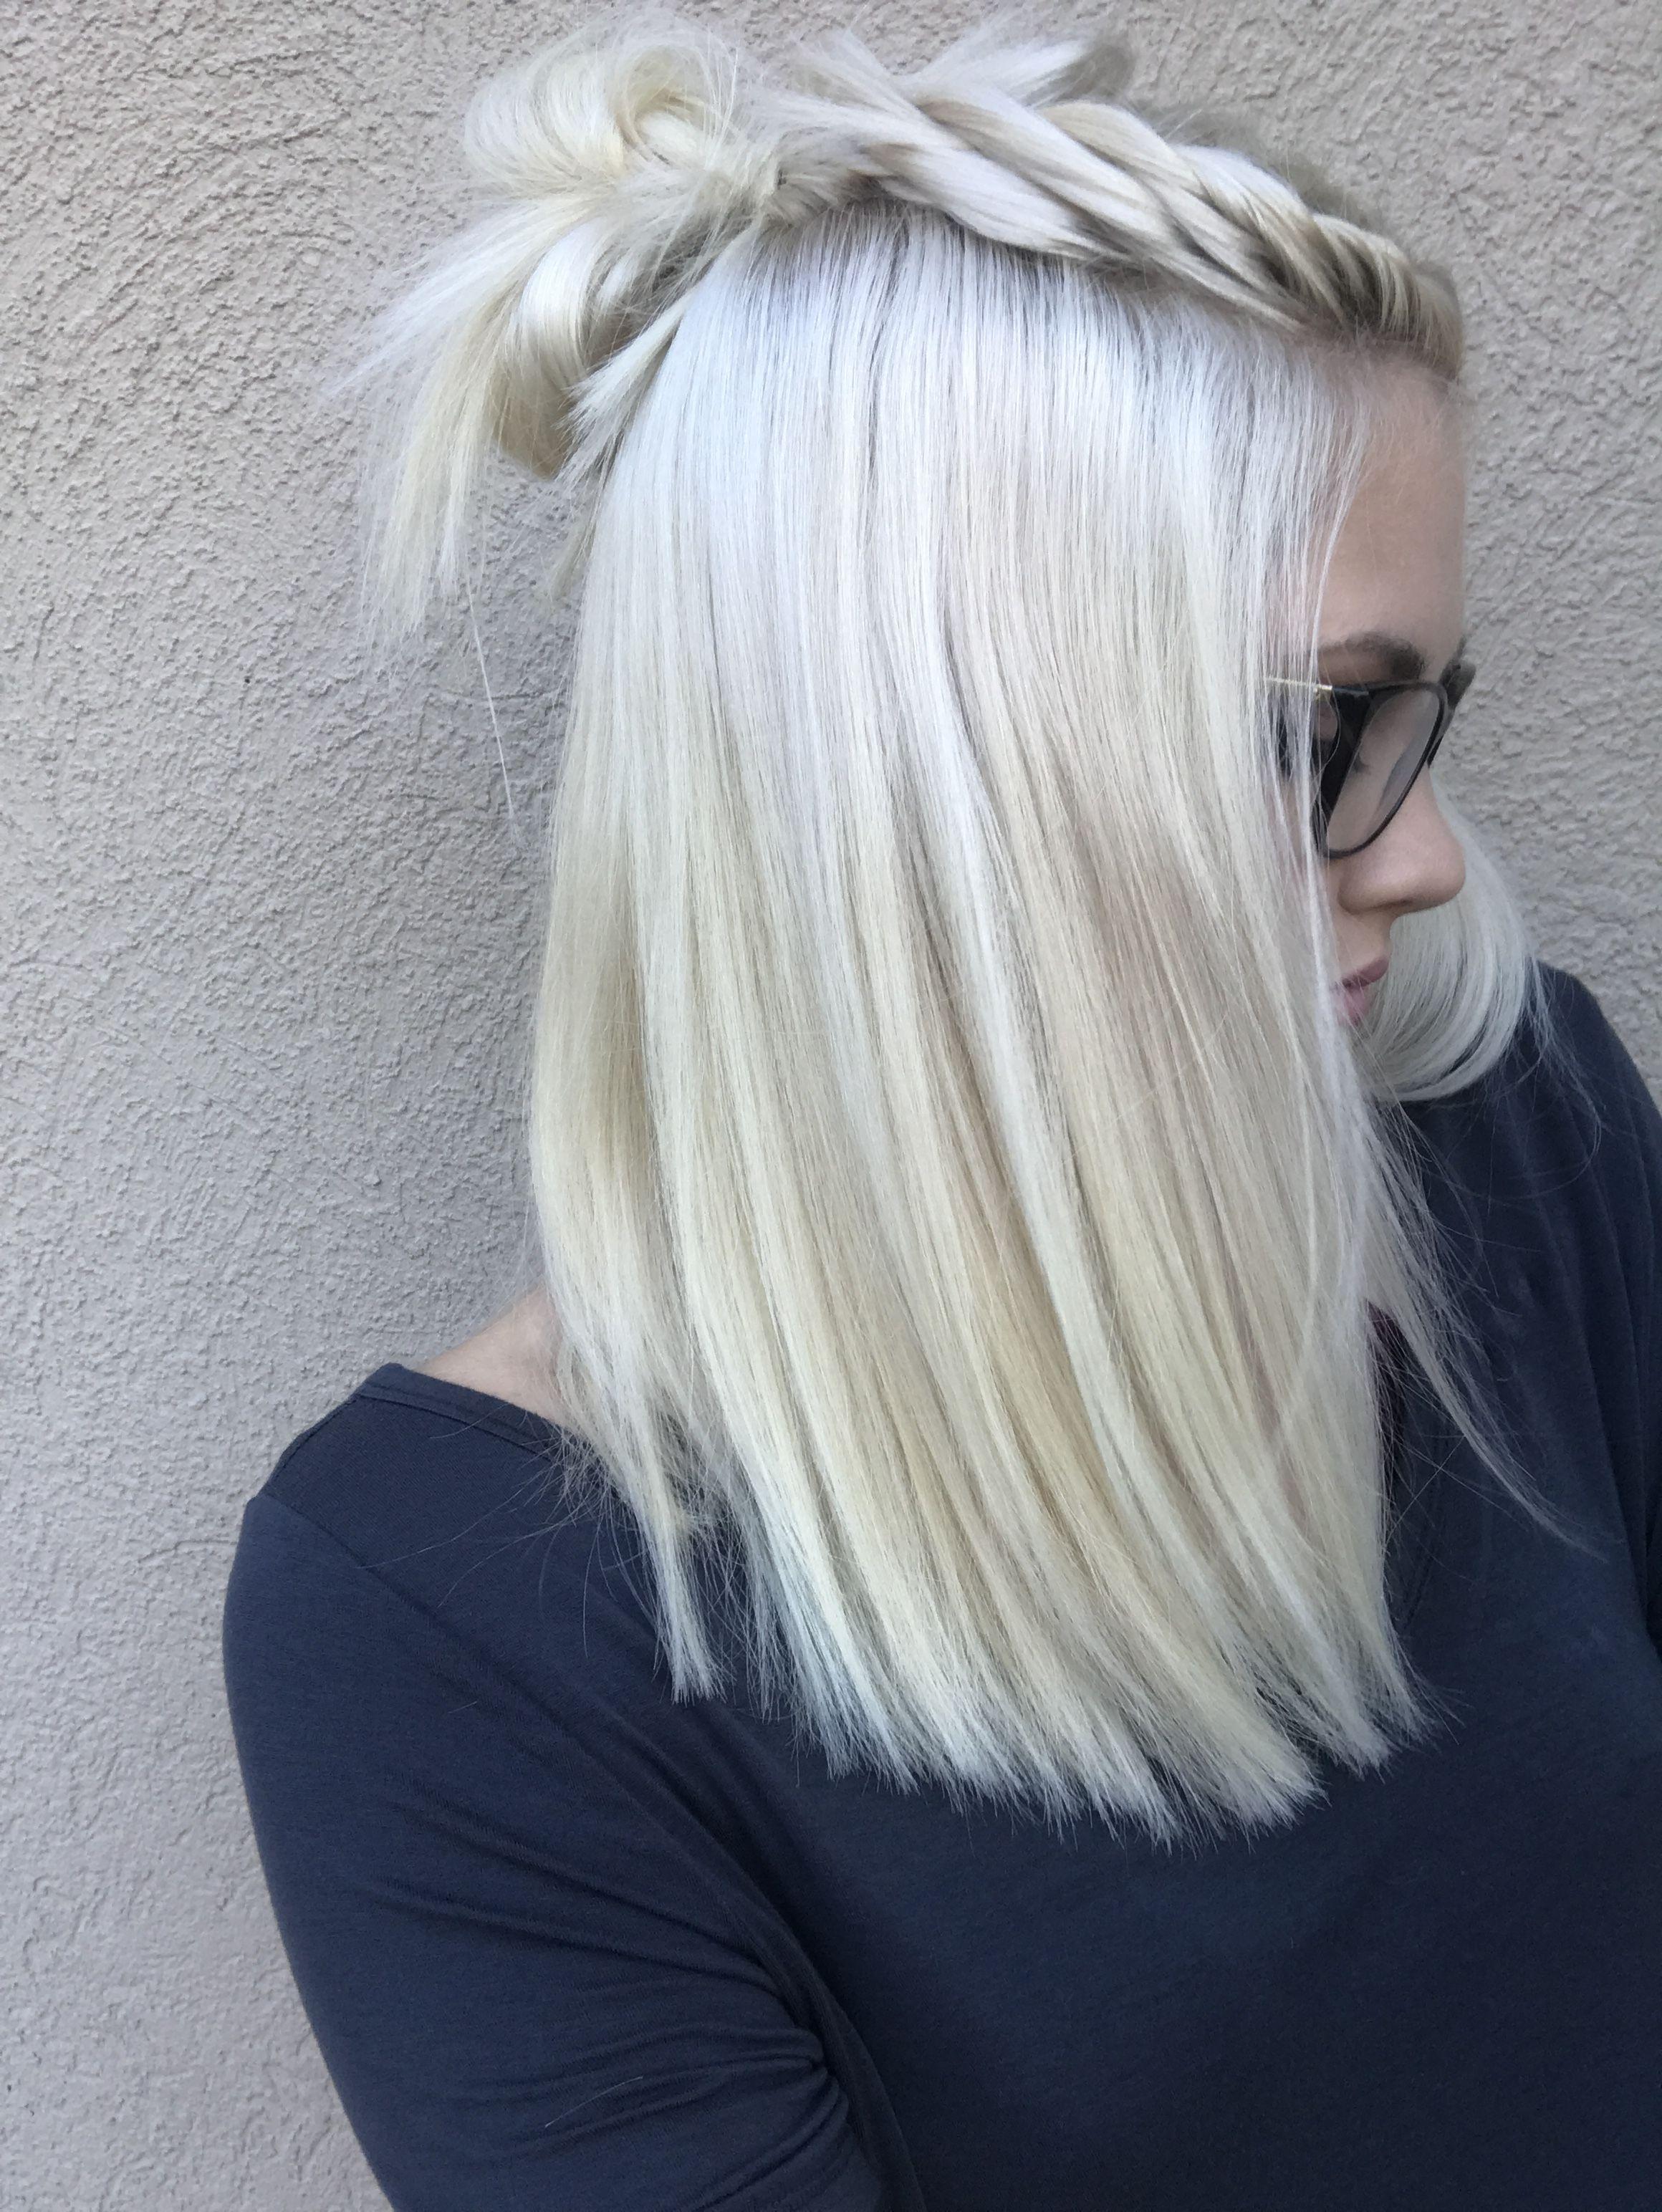 icy blonde hair ❄️❄️❄️ | hair ideas in 2019 | ice